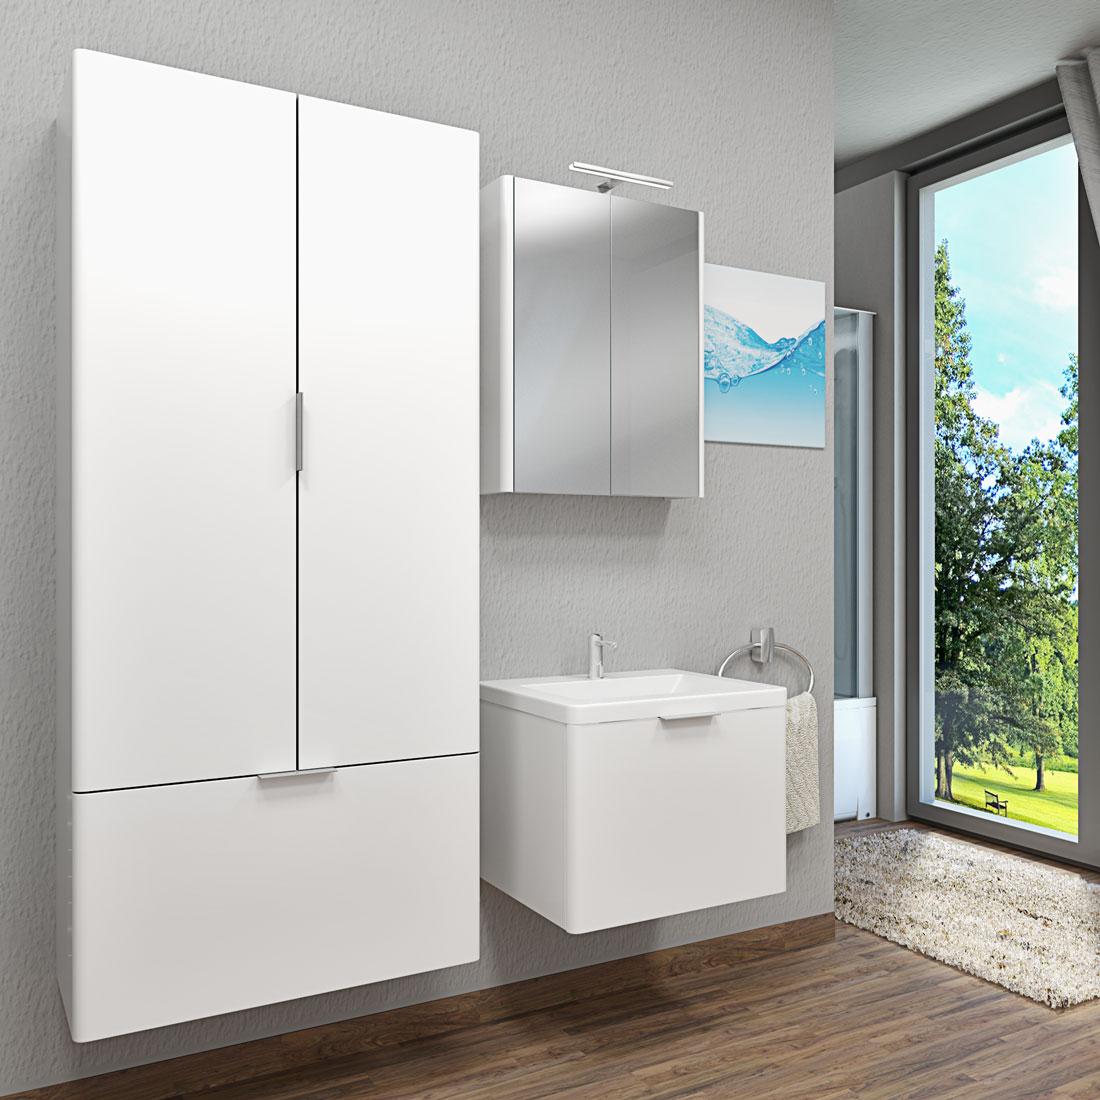 badschrank h ngeschrank hochschrank xxl 80x176x36cm. Black Bedroom Furniture Sets. Home Design Ideas